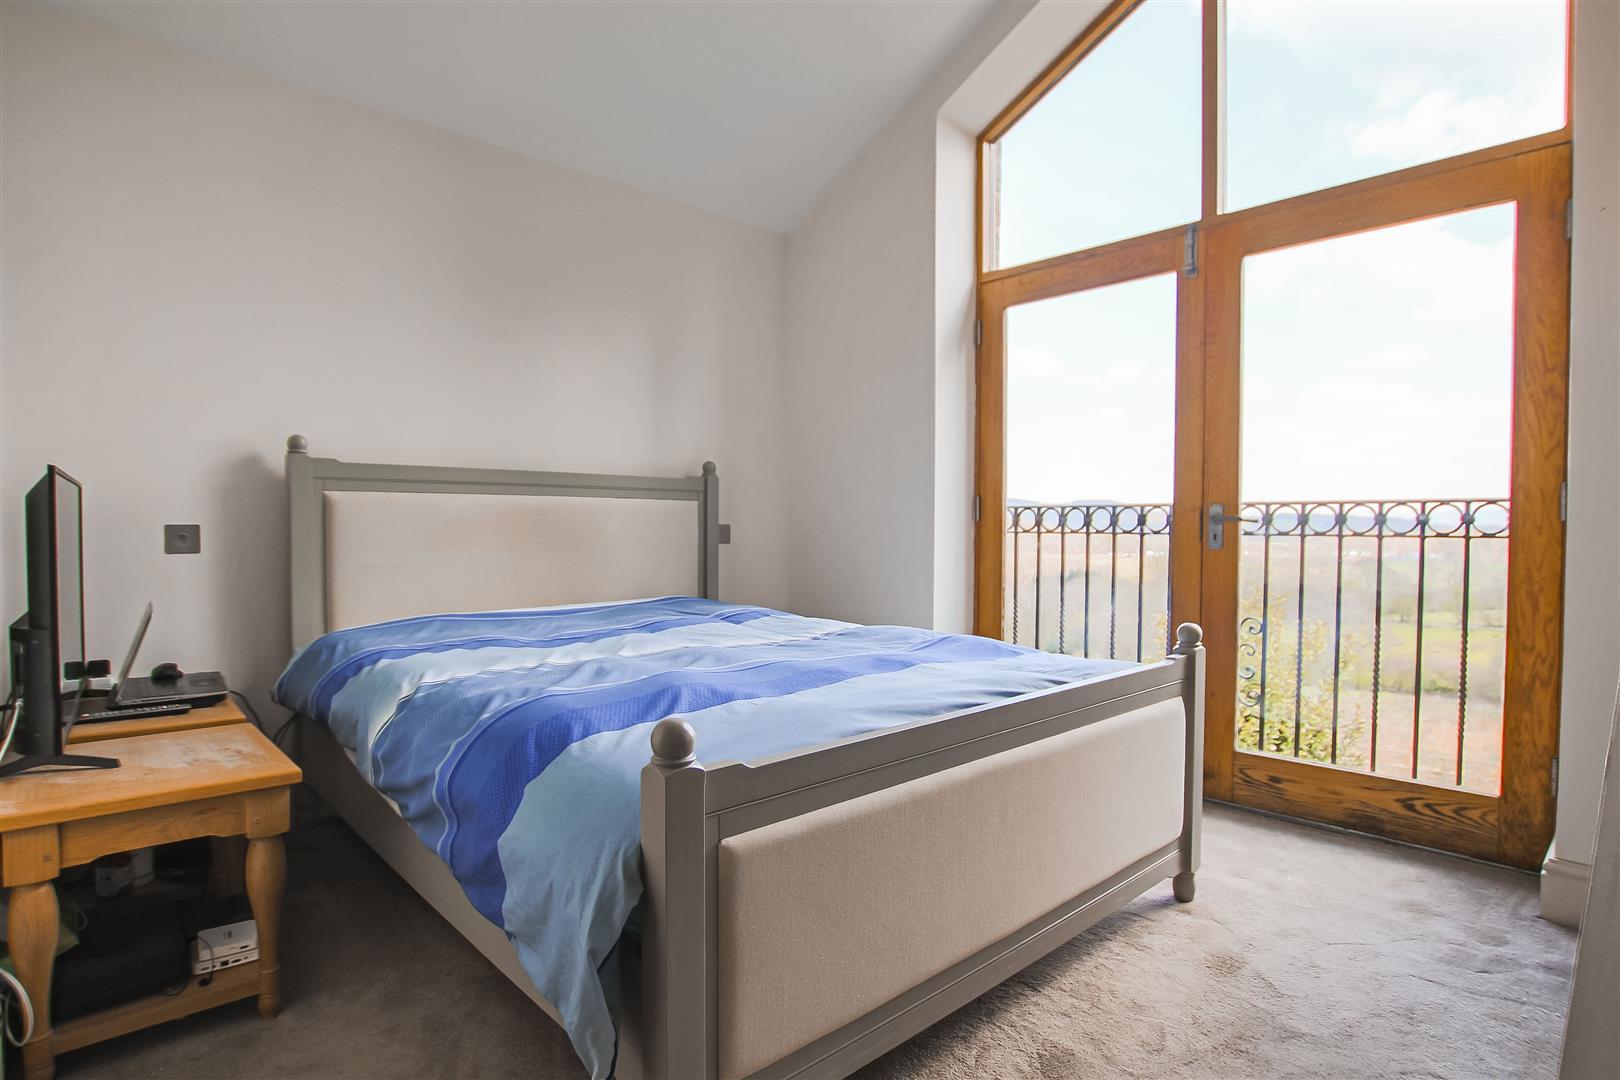 4 Bedroom Detached House For Sale - Farmhouse 12